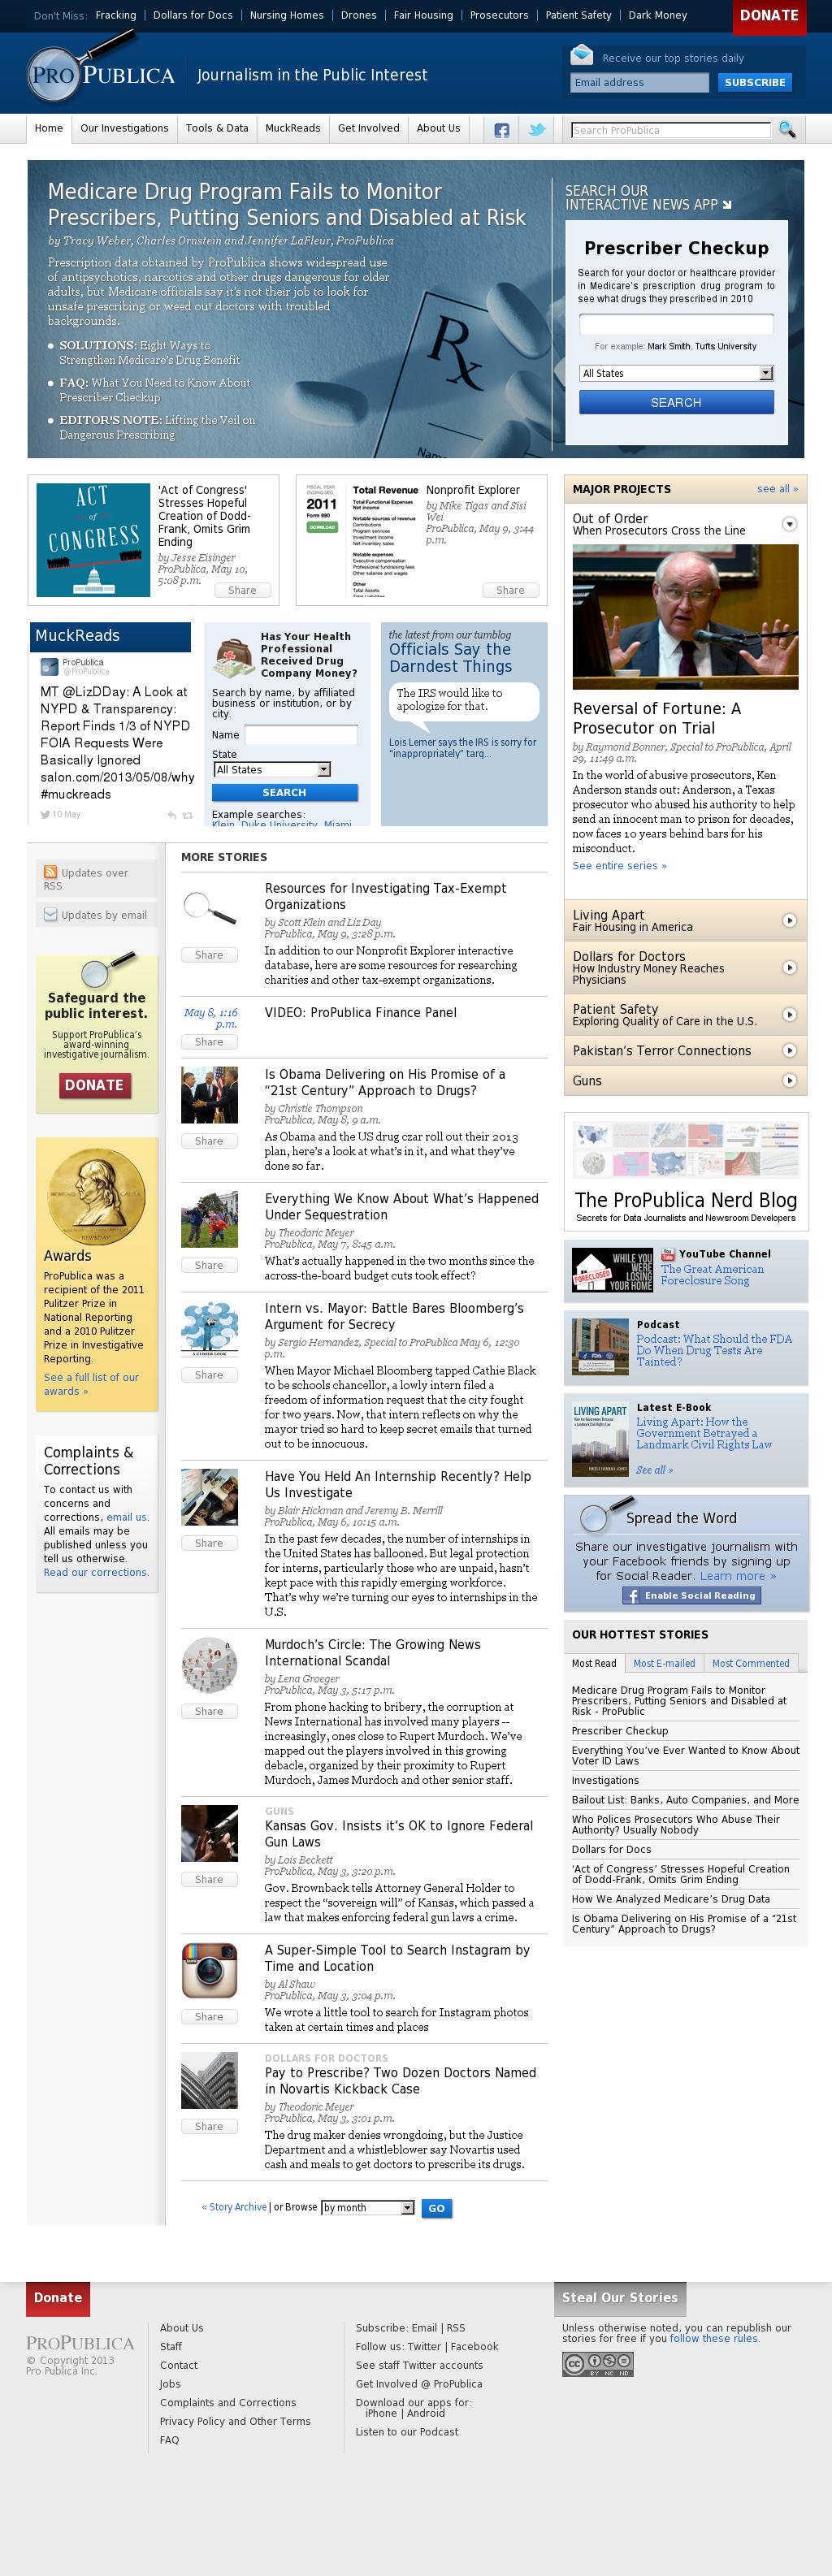 ProPublica at Monday May 13, 2013, 7:18 a.m. UTC